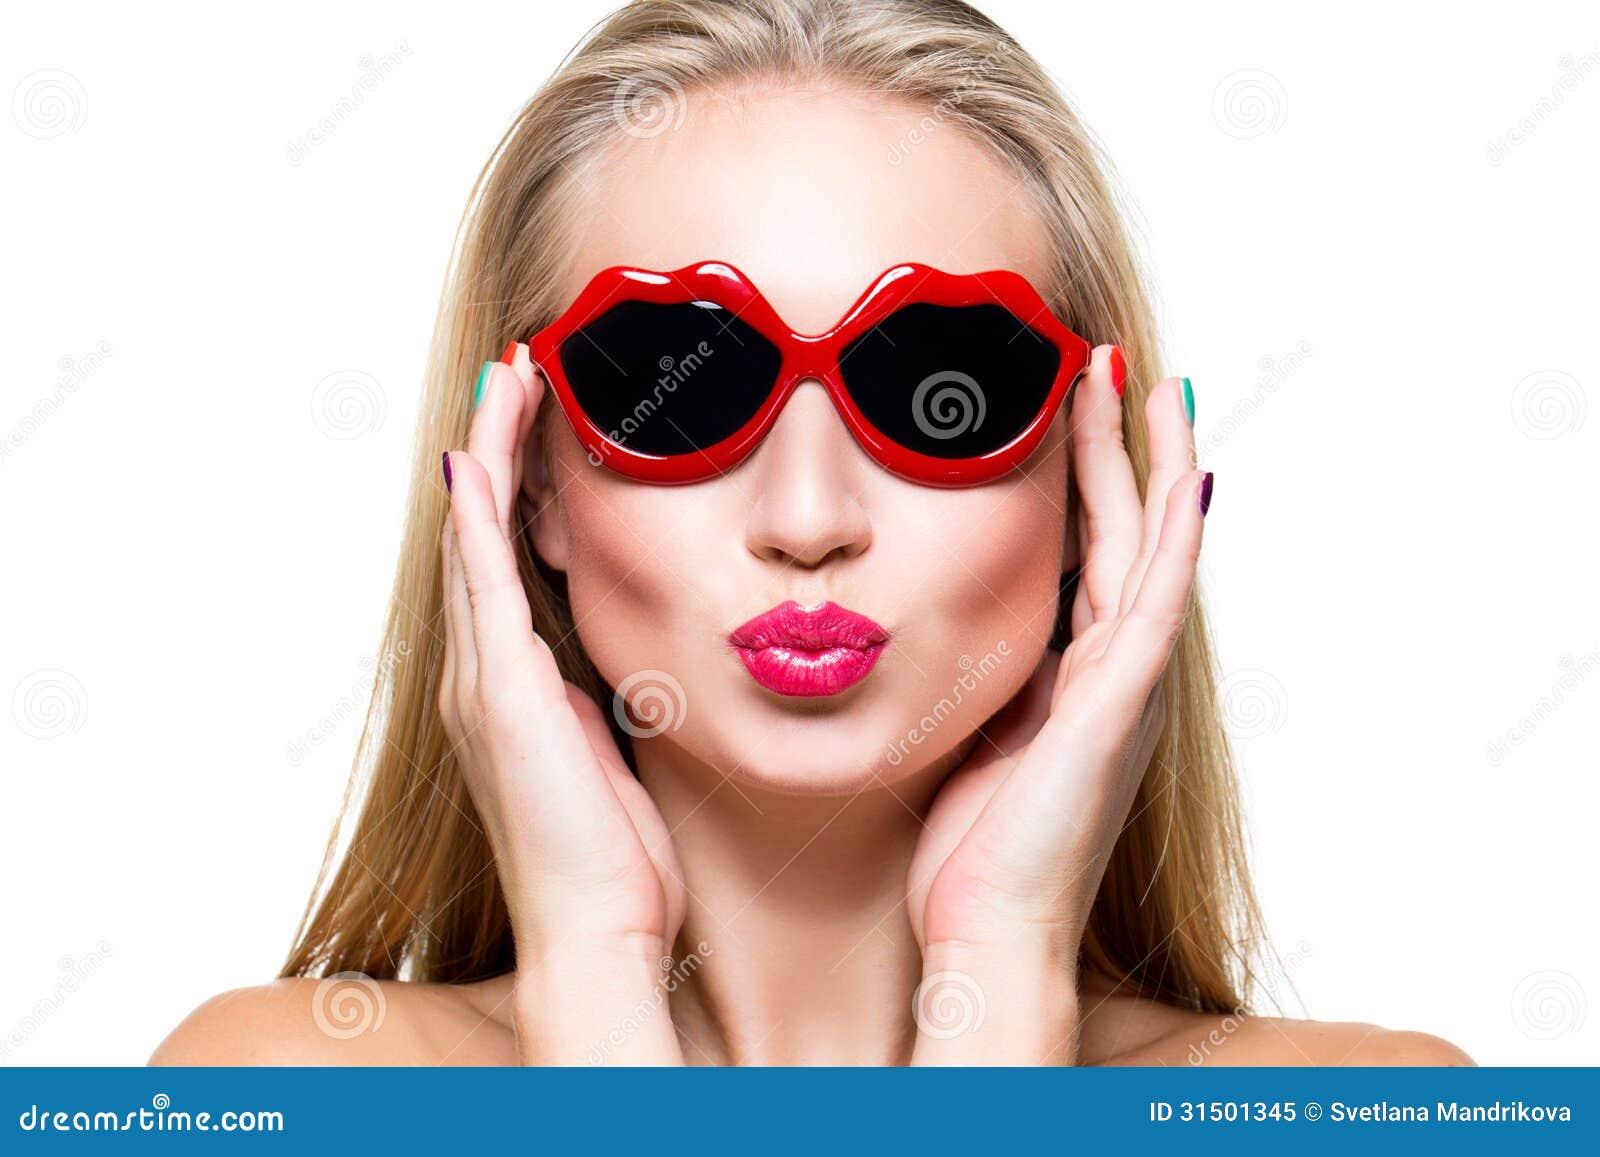 Девушка губы очки